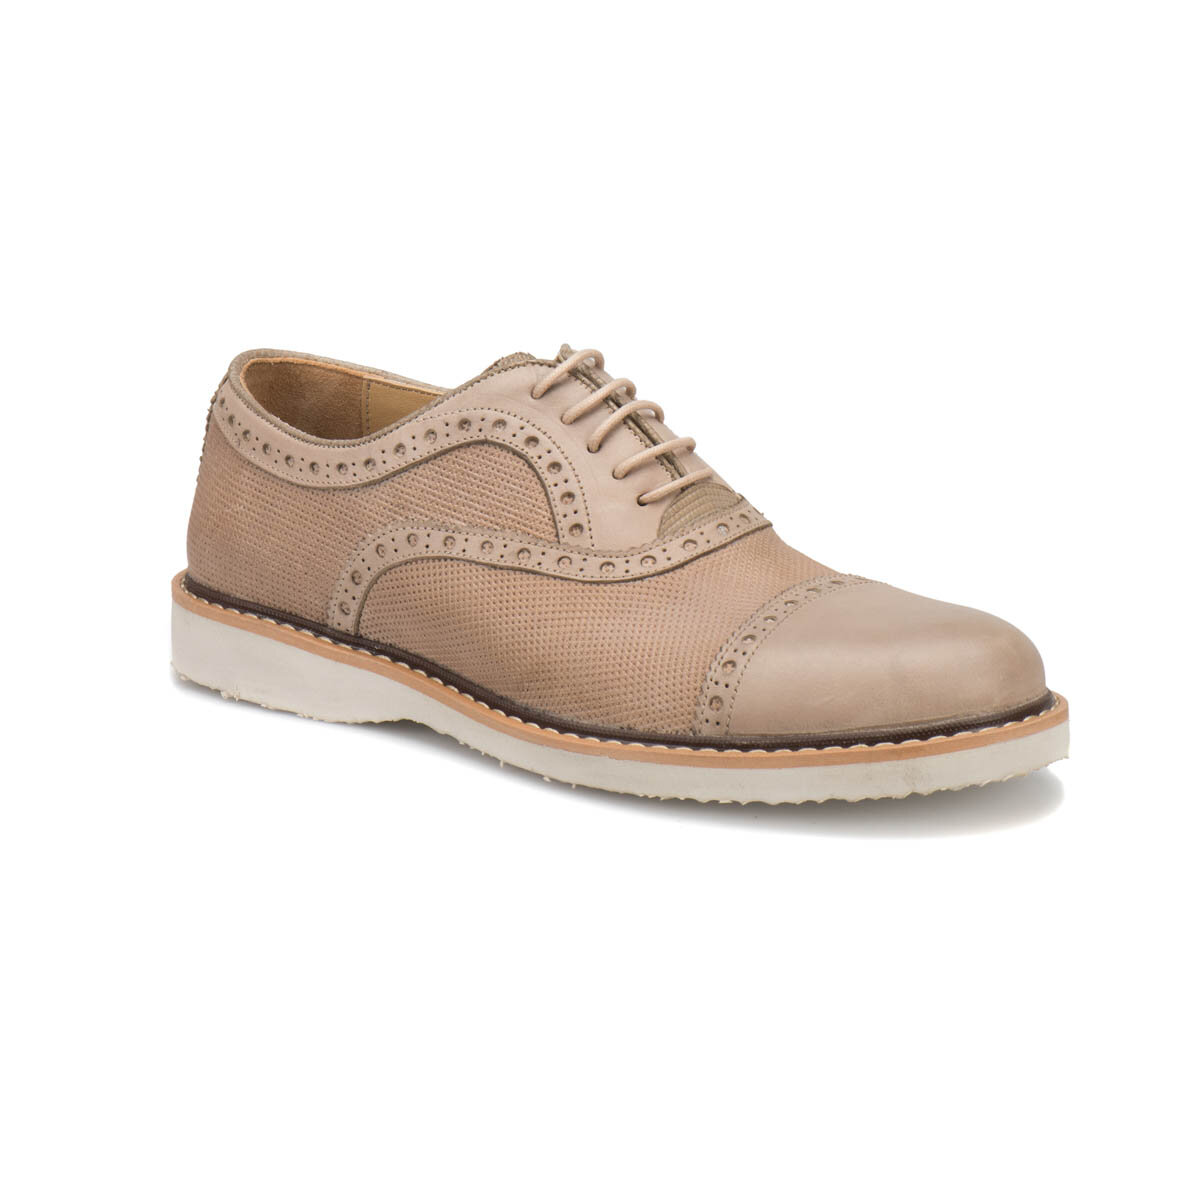 FLO 7416 M 1506 Beige Men 'S Modern Shoes Garamond